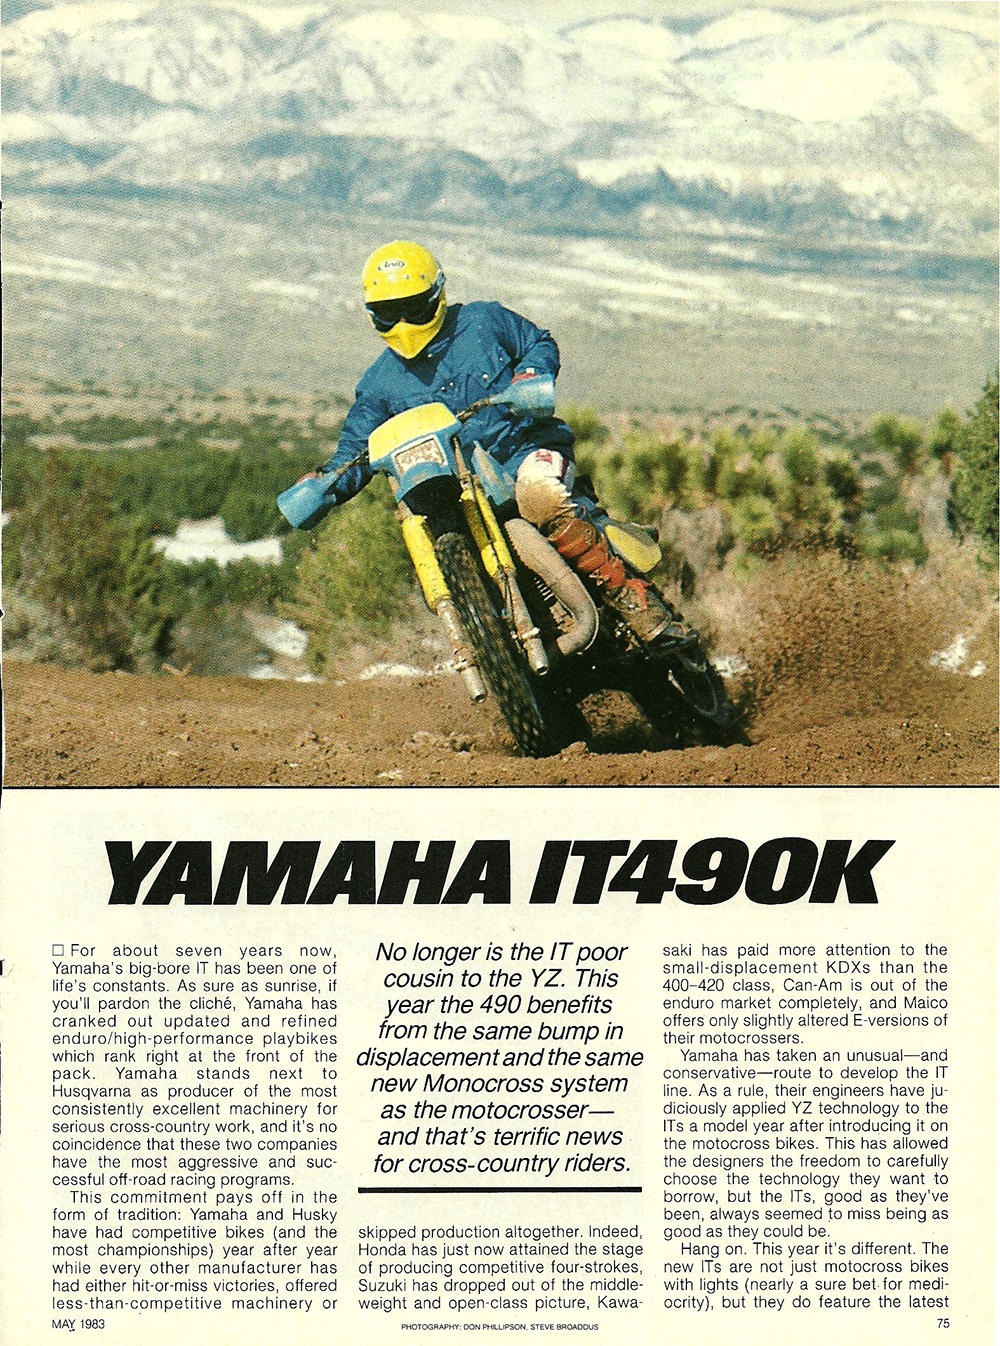 1983 Yamaha IT490K road test 1.jpg